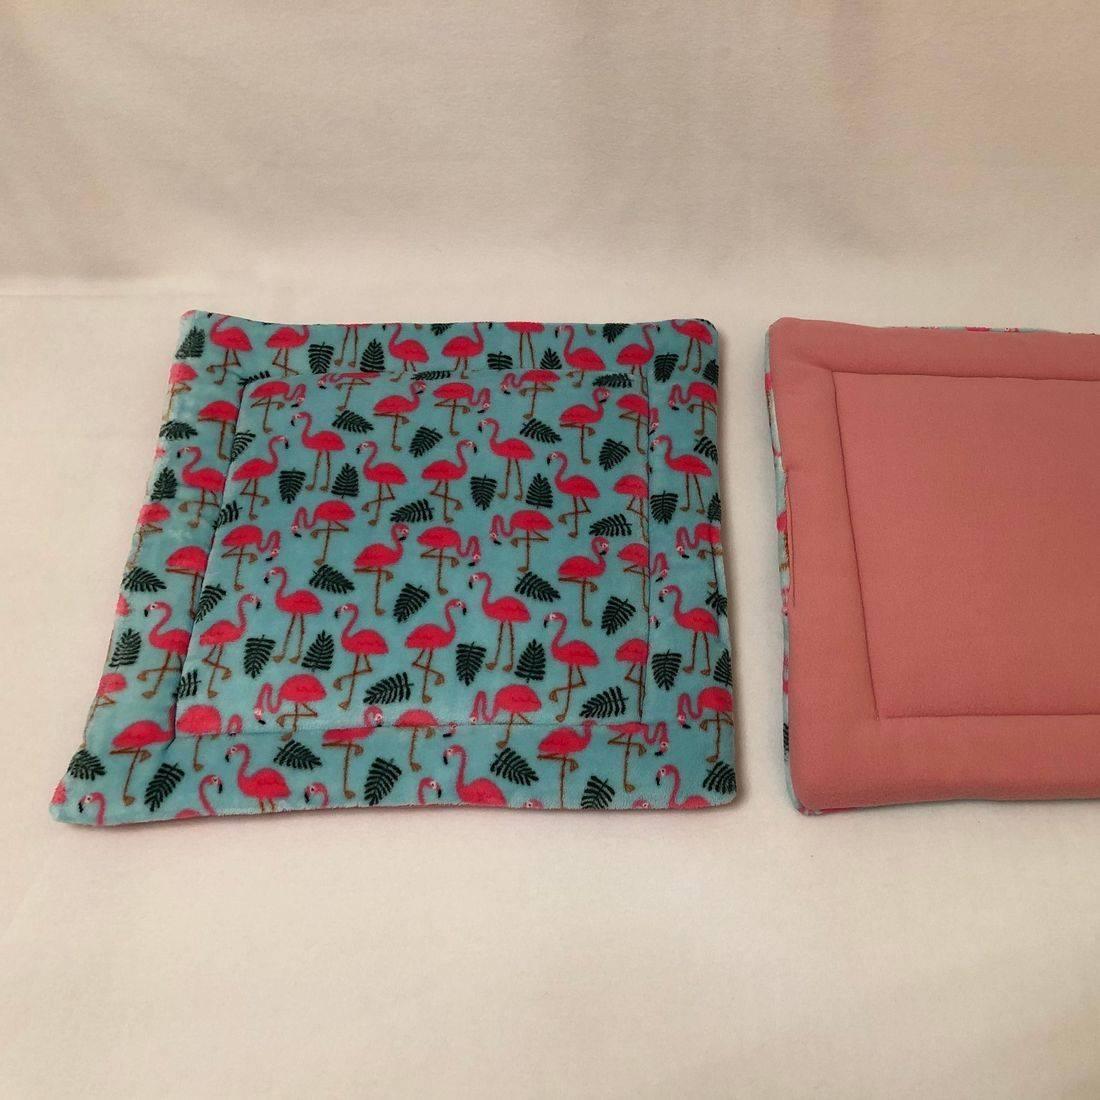 Lap pad show pen pad mint flamingo and rose pink